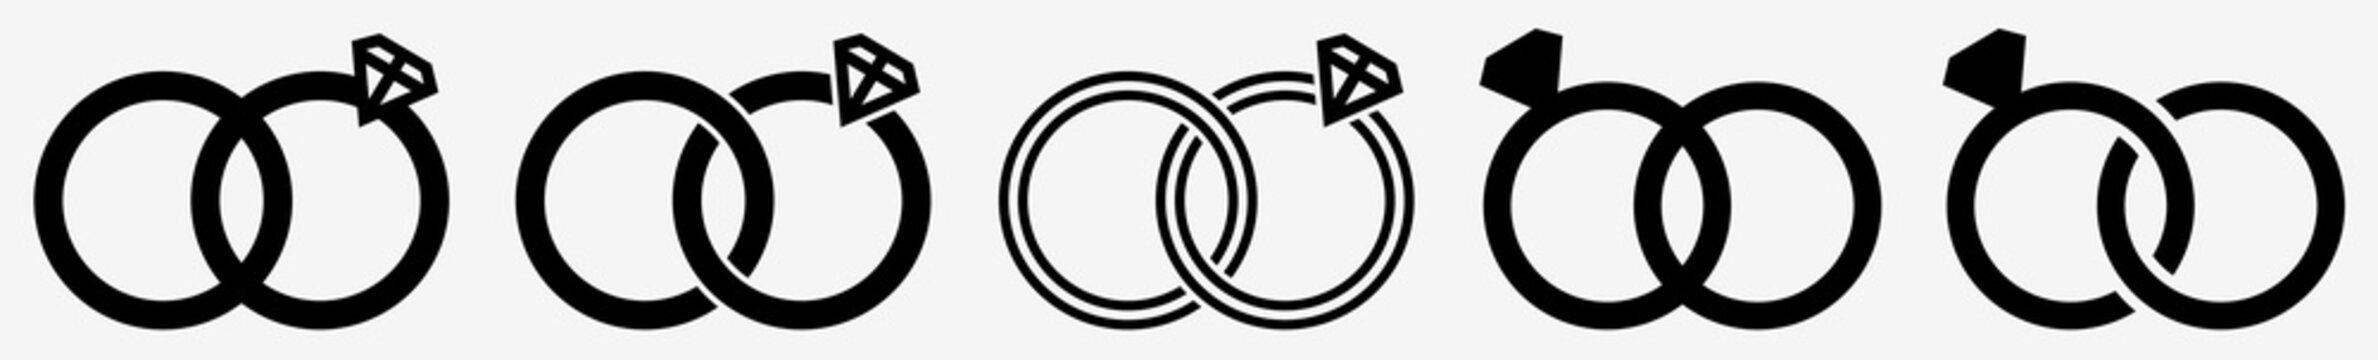 Wedding Rings Icon Diamond Wedding Ring Set | Wedding Ring Icon Jewellery Vector Illustration Logo | Wedding-Ring Icon Isolated Wedding-Rings Collection